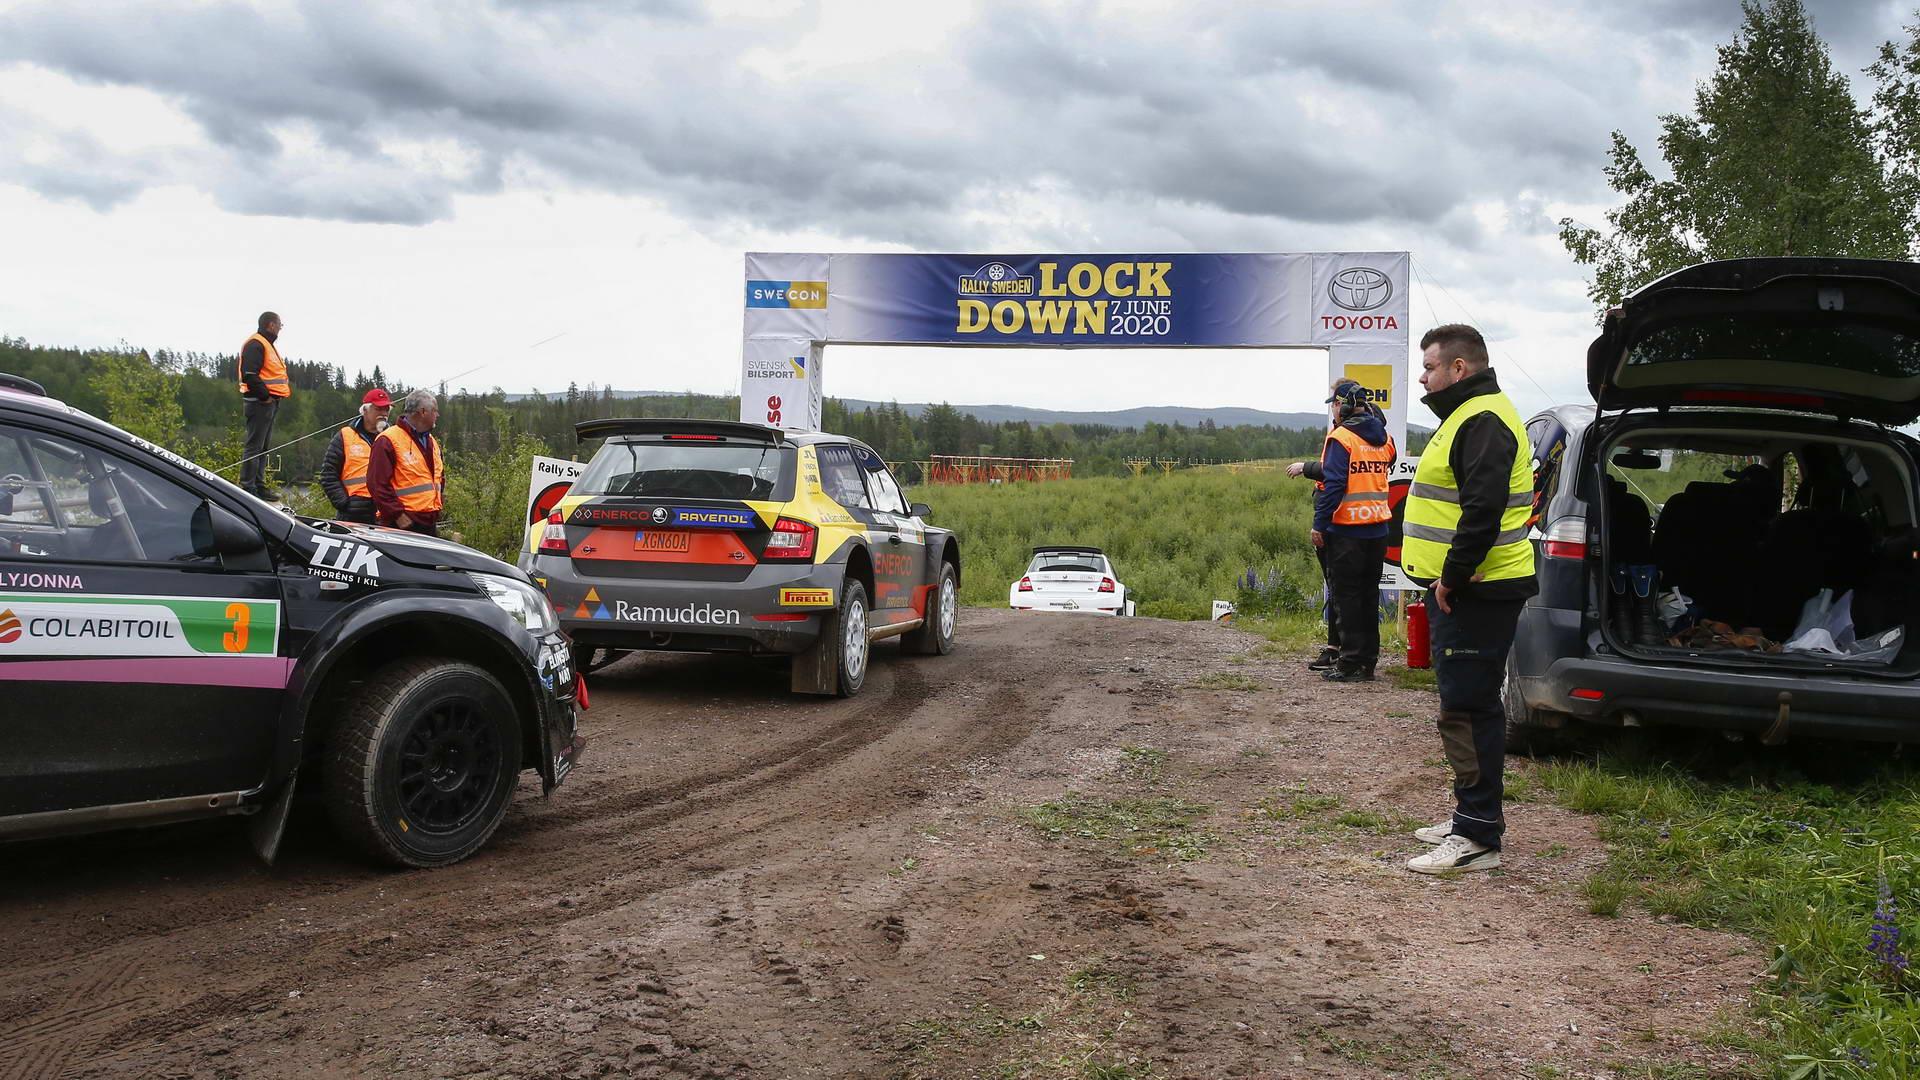 Rally Sweden Lockdown